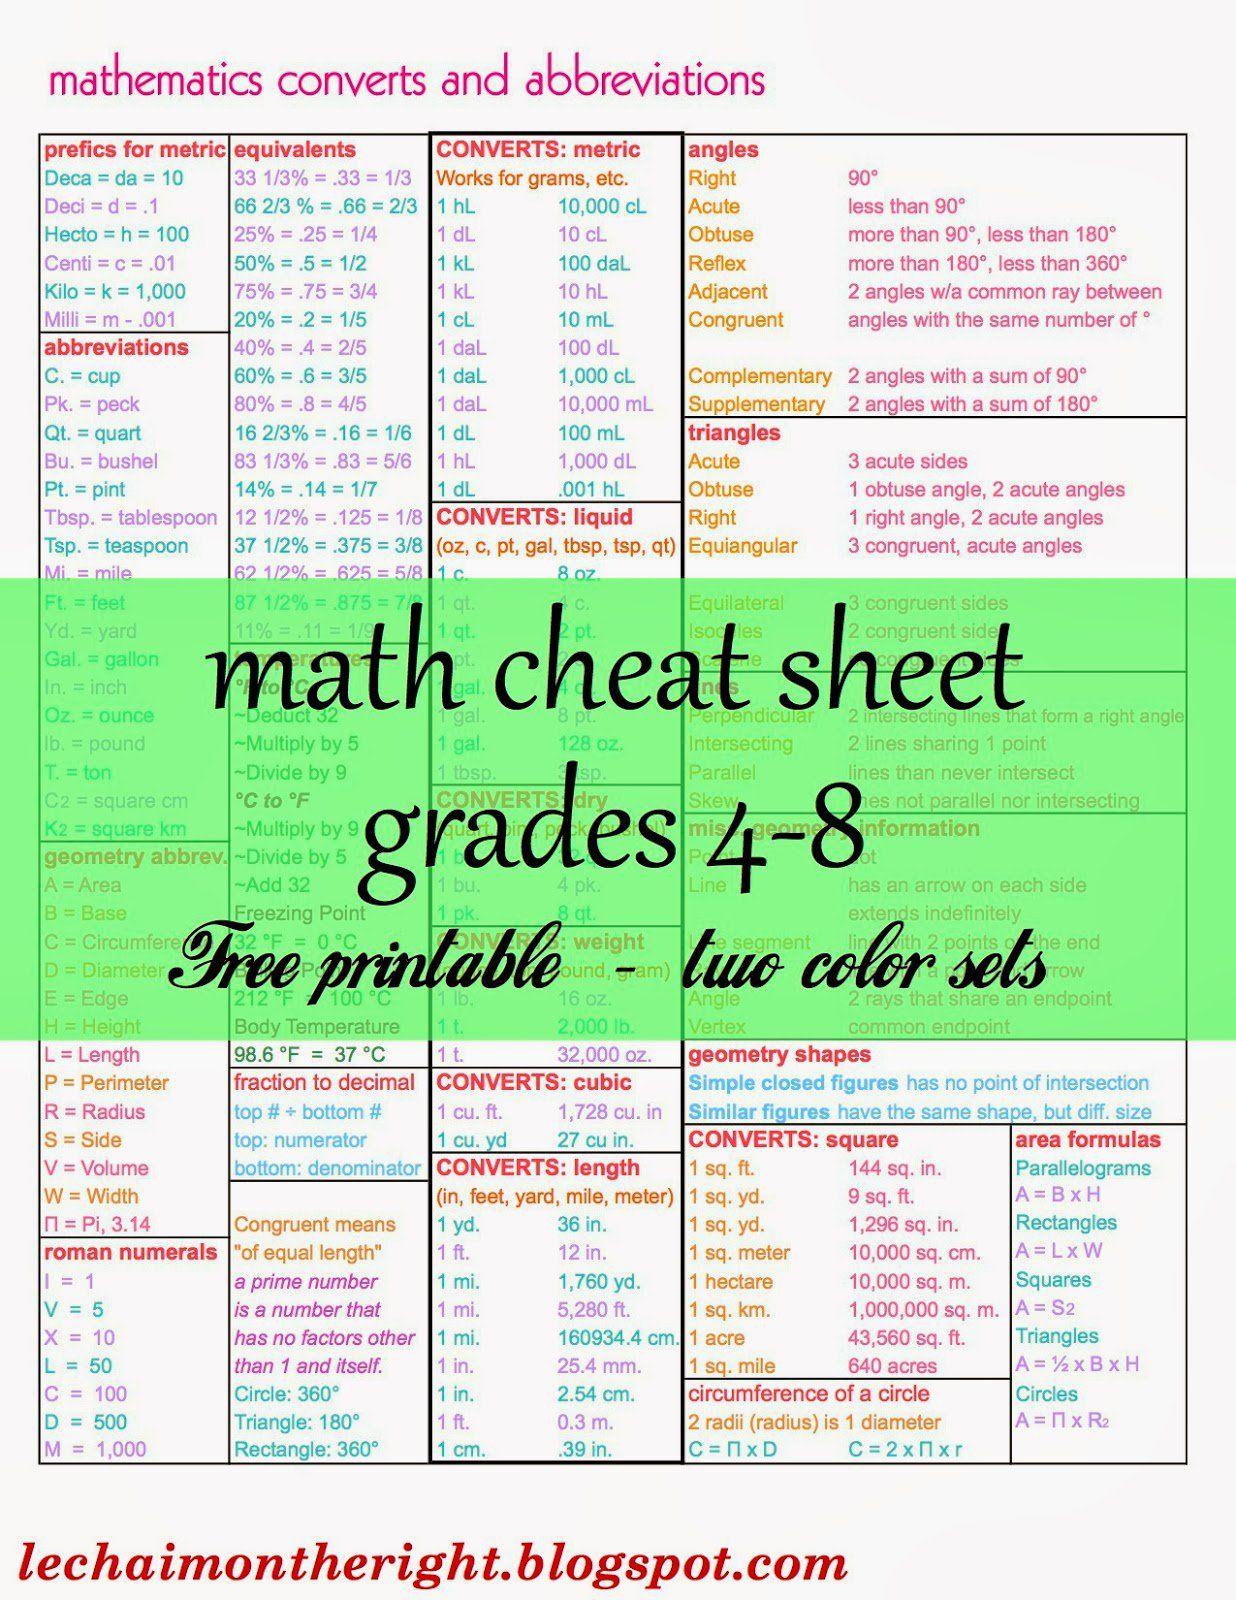 Ultimate Math Cheat Sheet / 2 color sets, designed for A Beka but ...